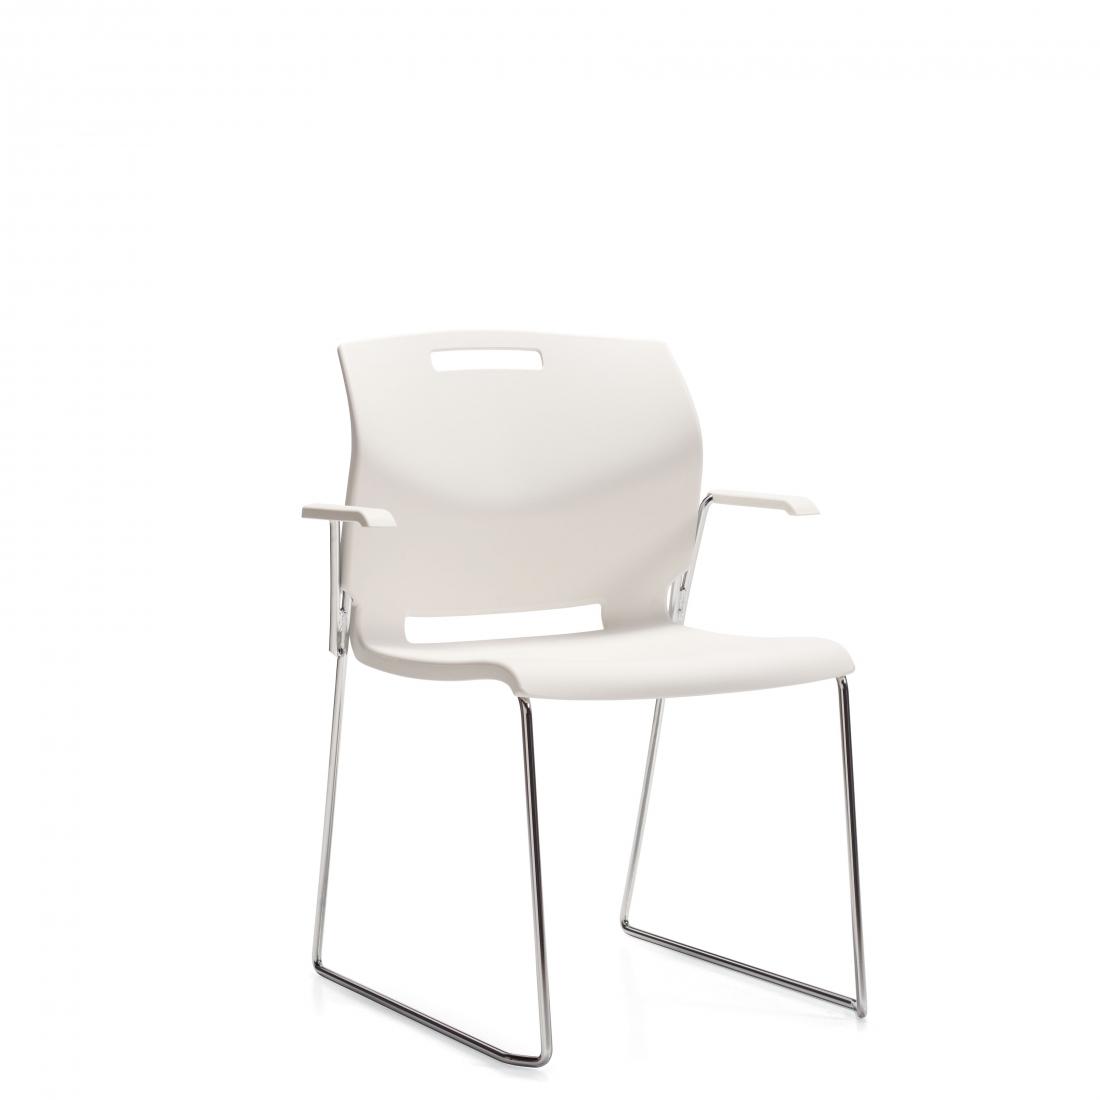 Popcorn arm chair